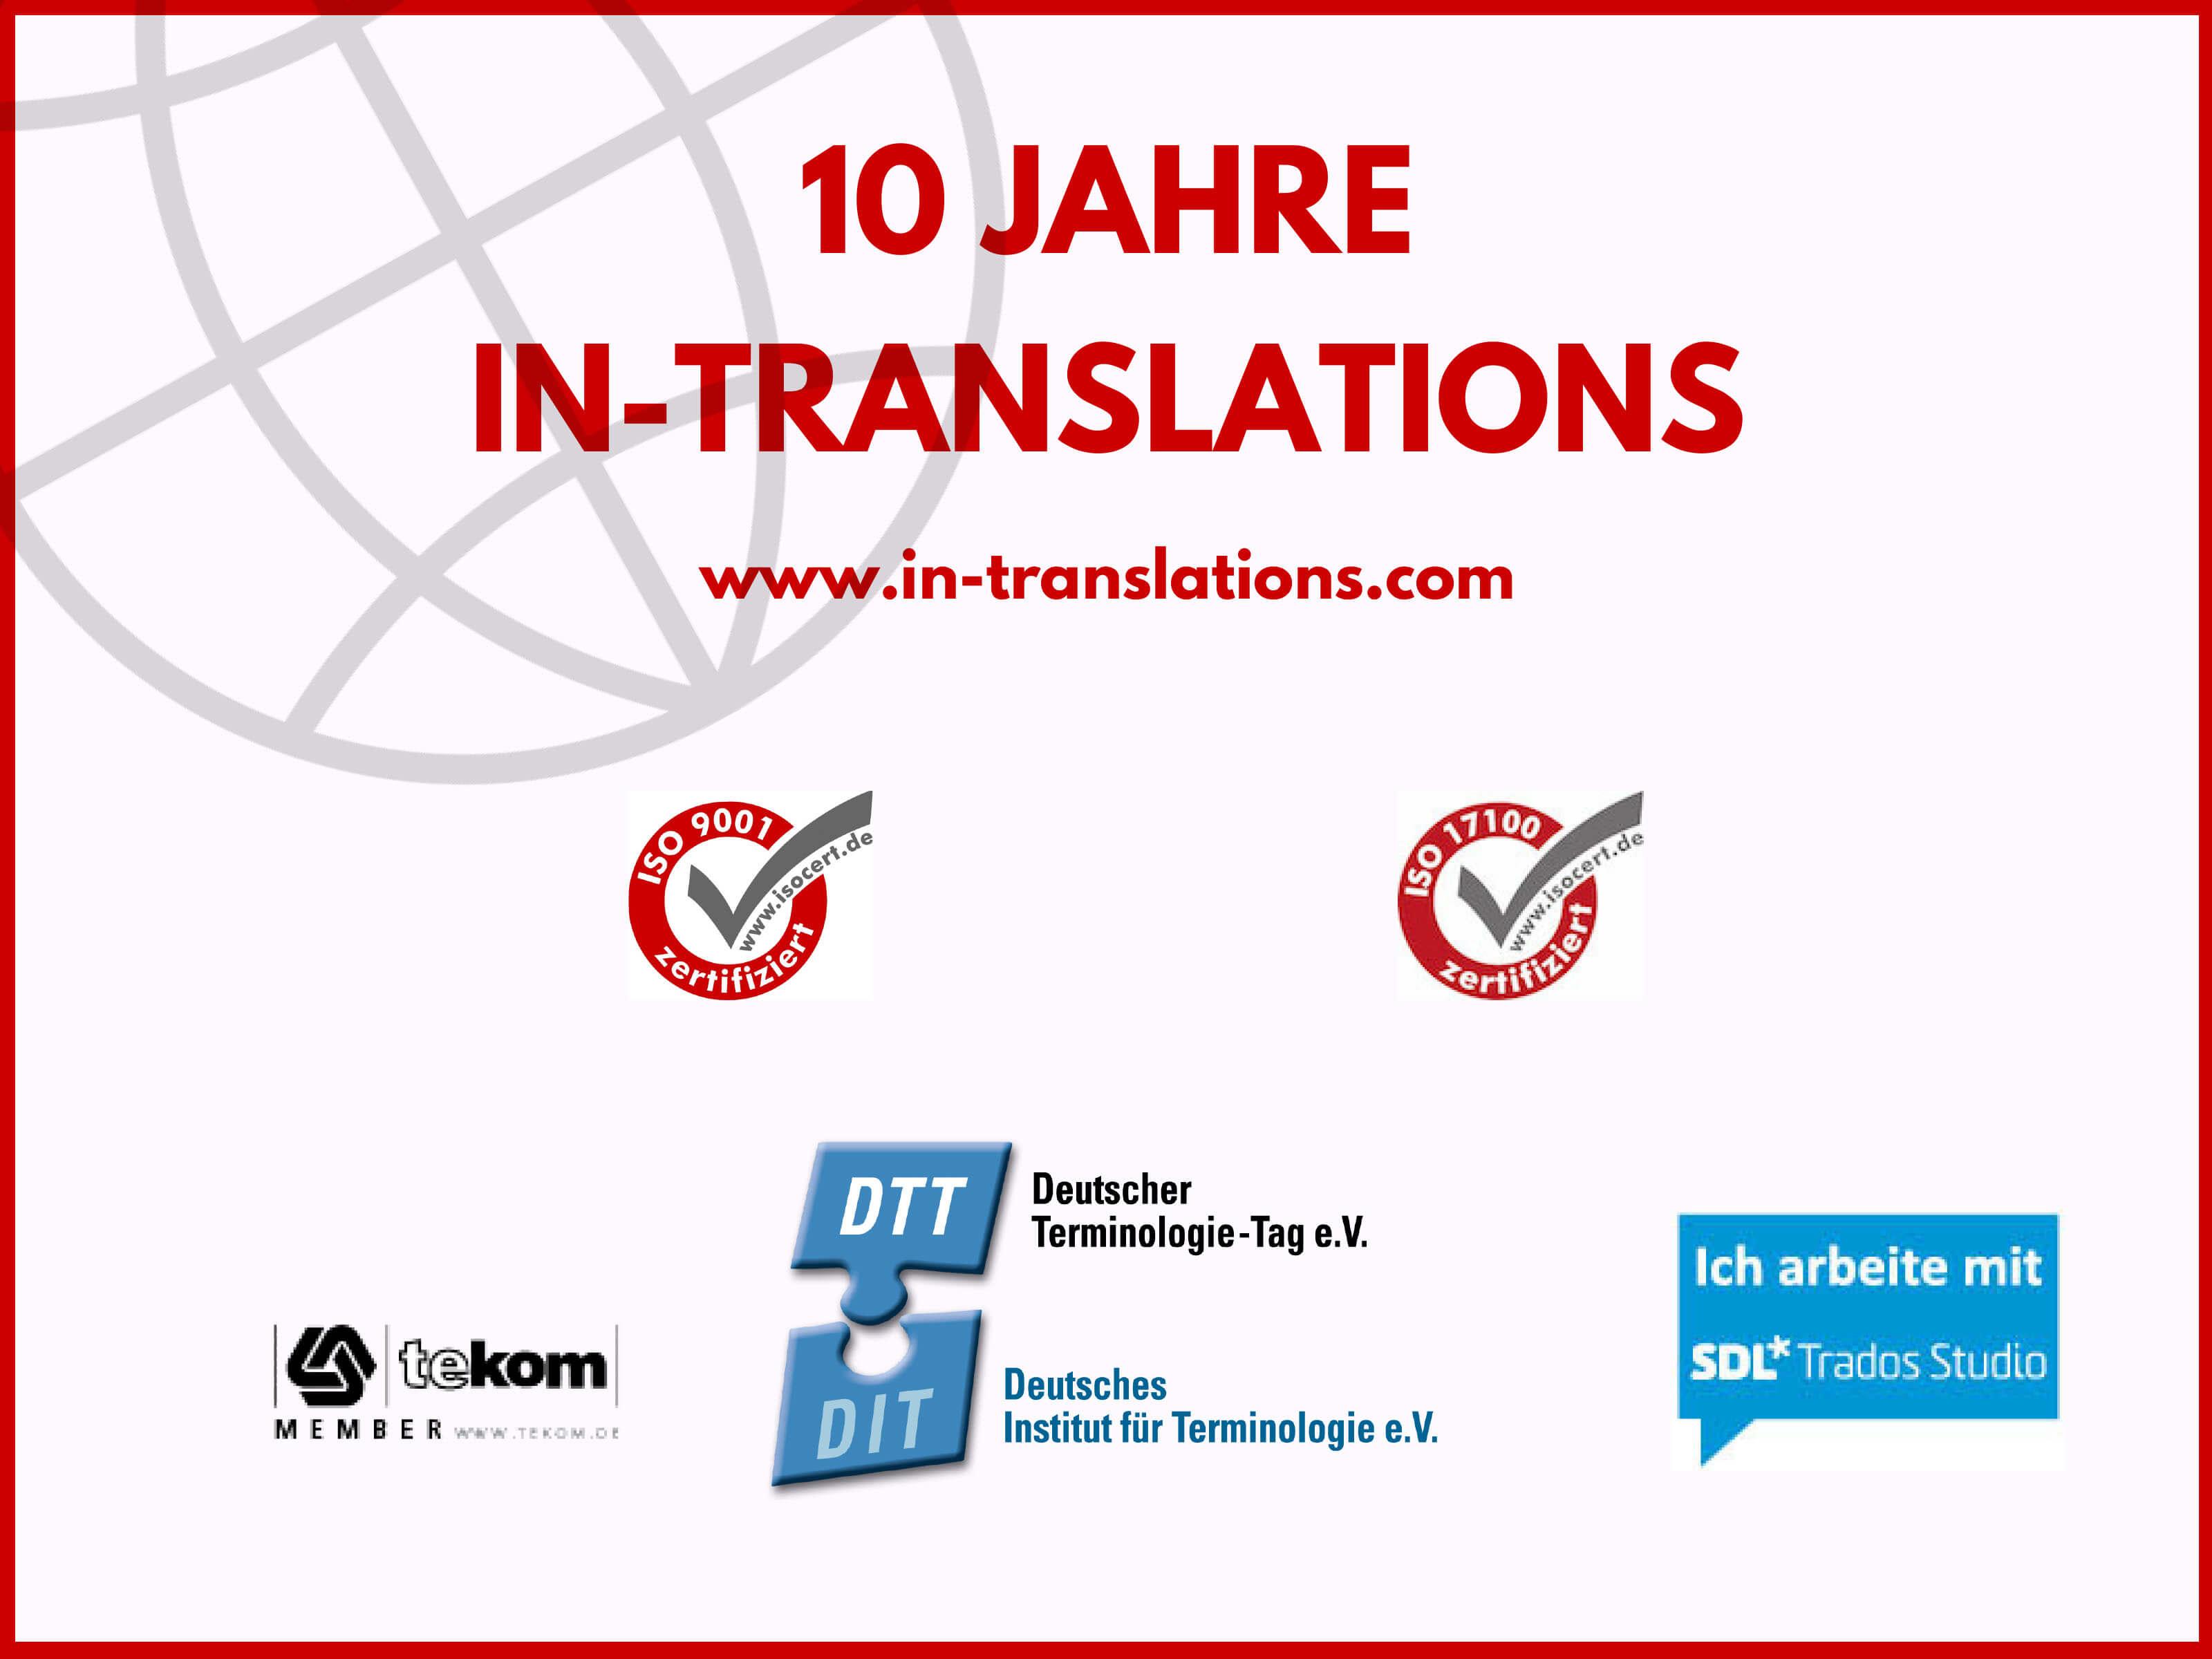 Firmenjubiläum bei IN-TRANSLATIONS